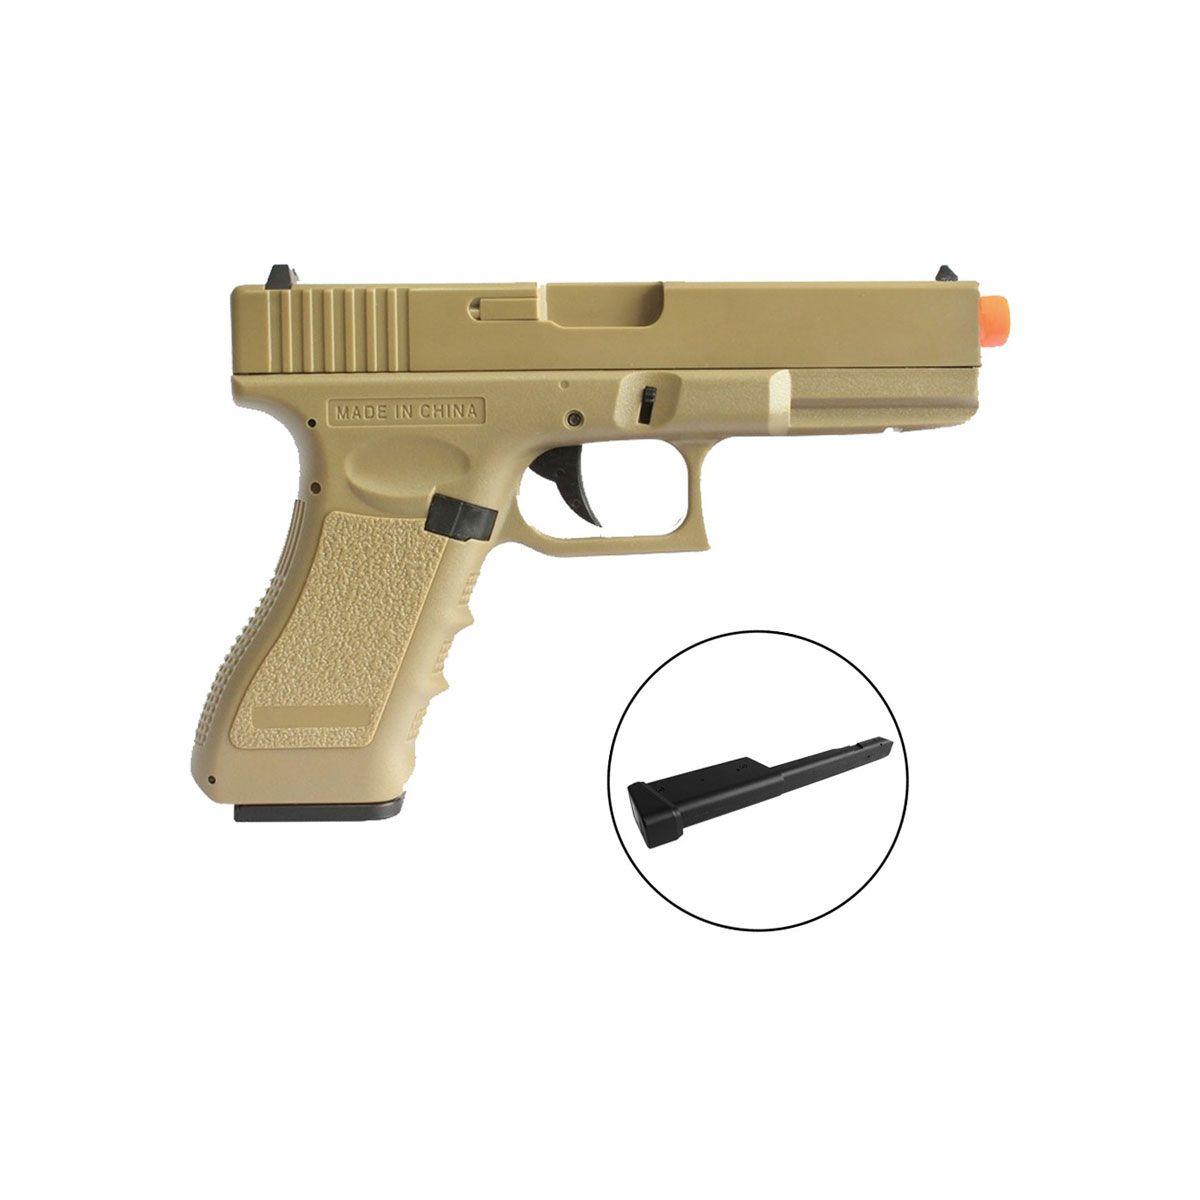 Pistola de Airsoft Glock G18 Cm 030 Tan  Magazine Estendido combo